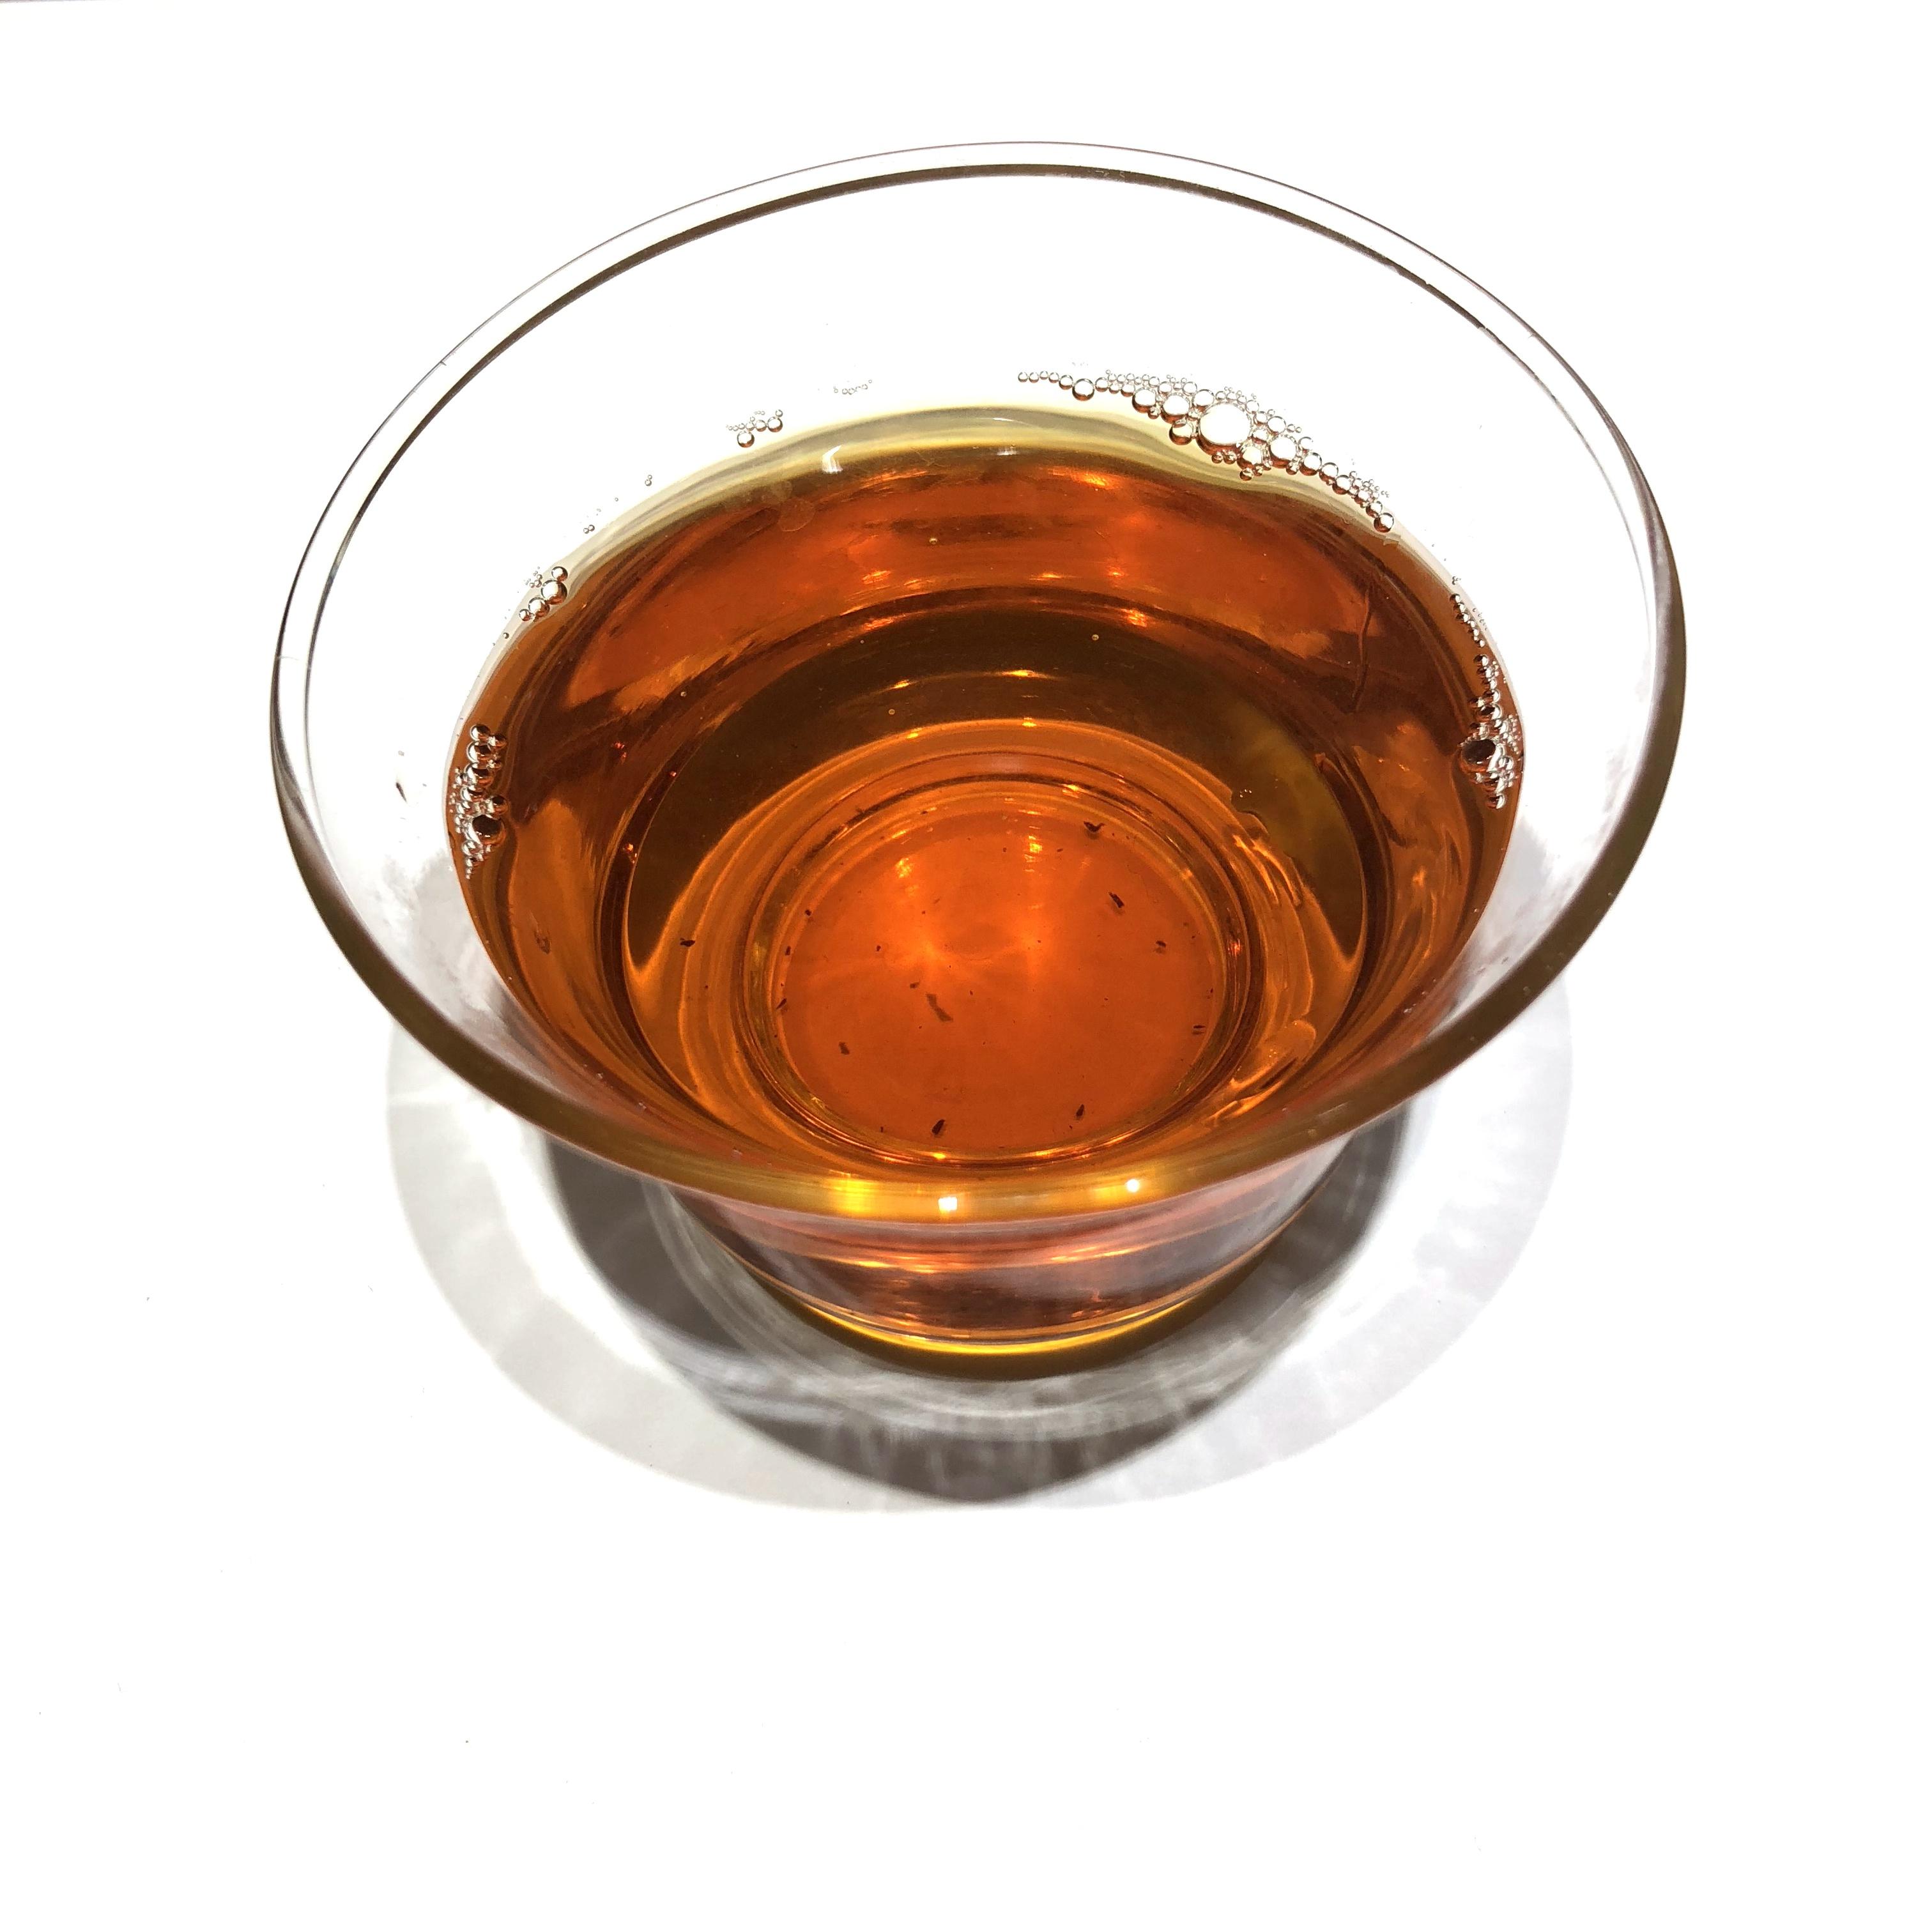 Chinese black tea with low price high quality - 4uTea   4uTea.com